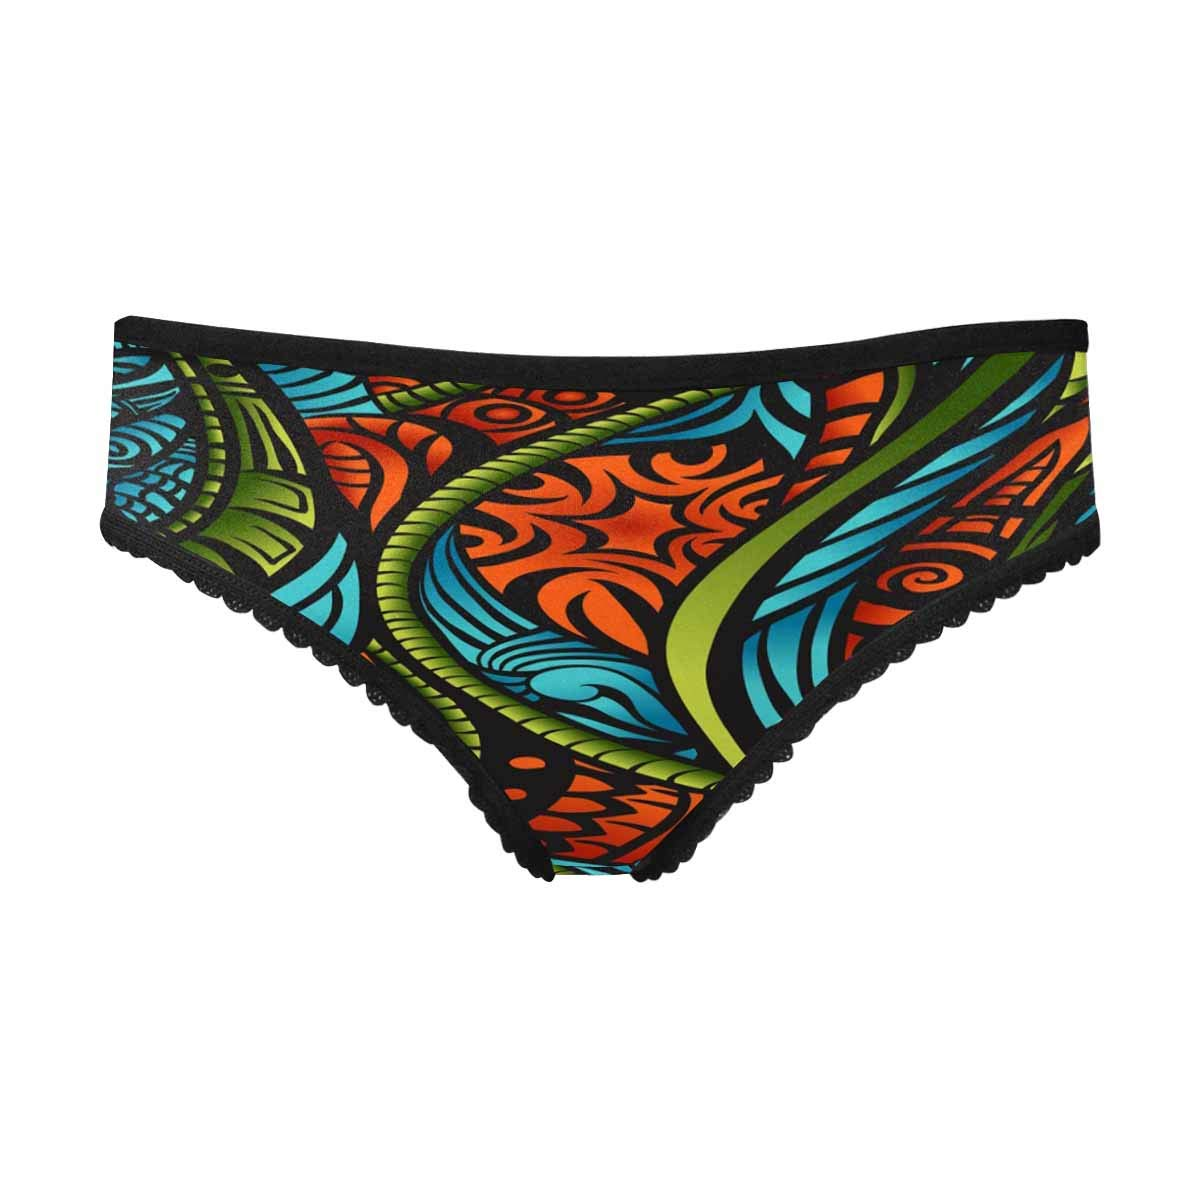 InterestPrint Women's High Cut Briefs Panties Ethnic Style S